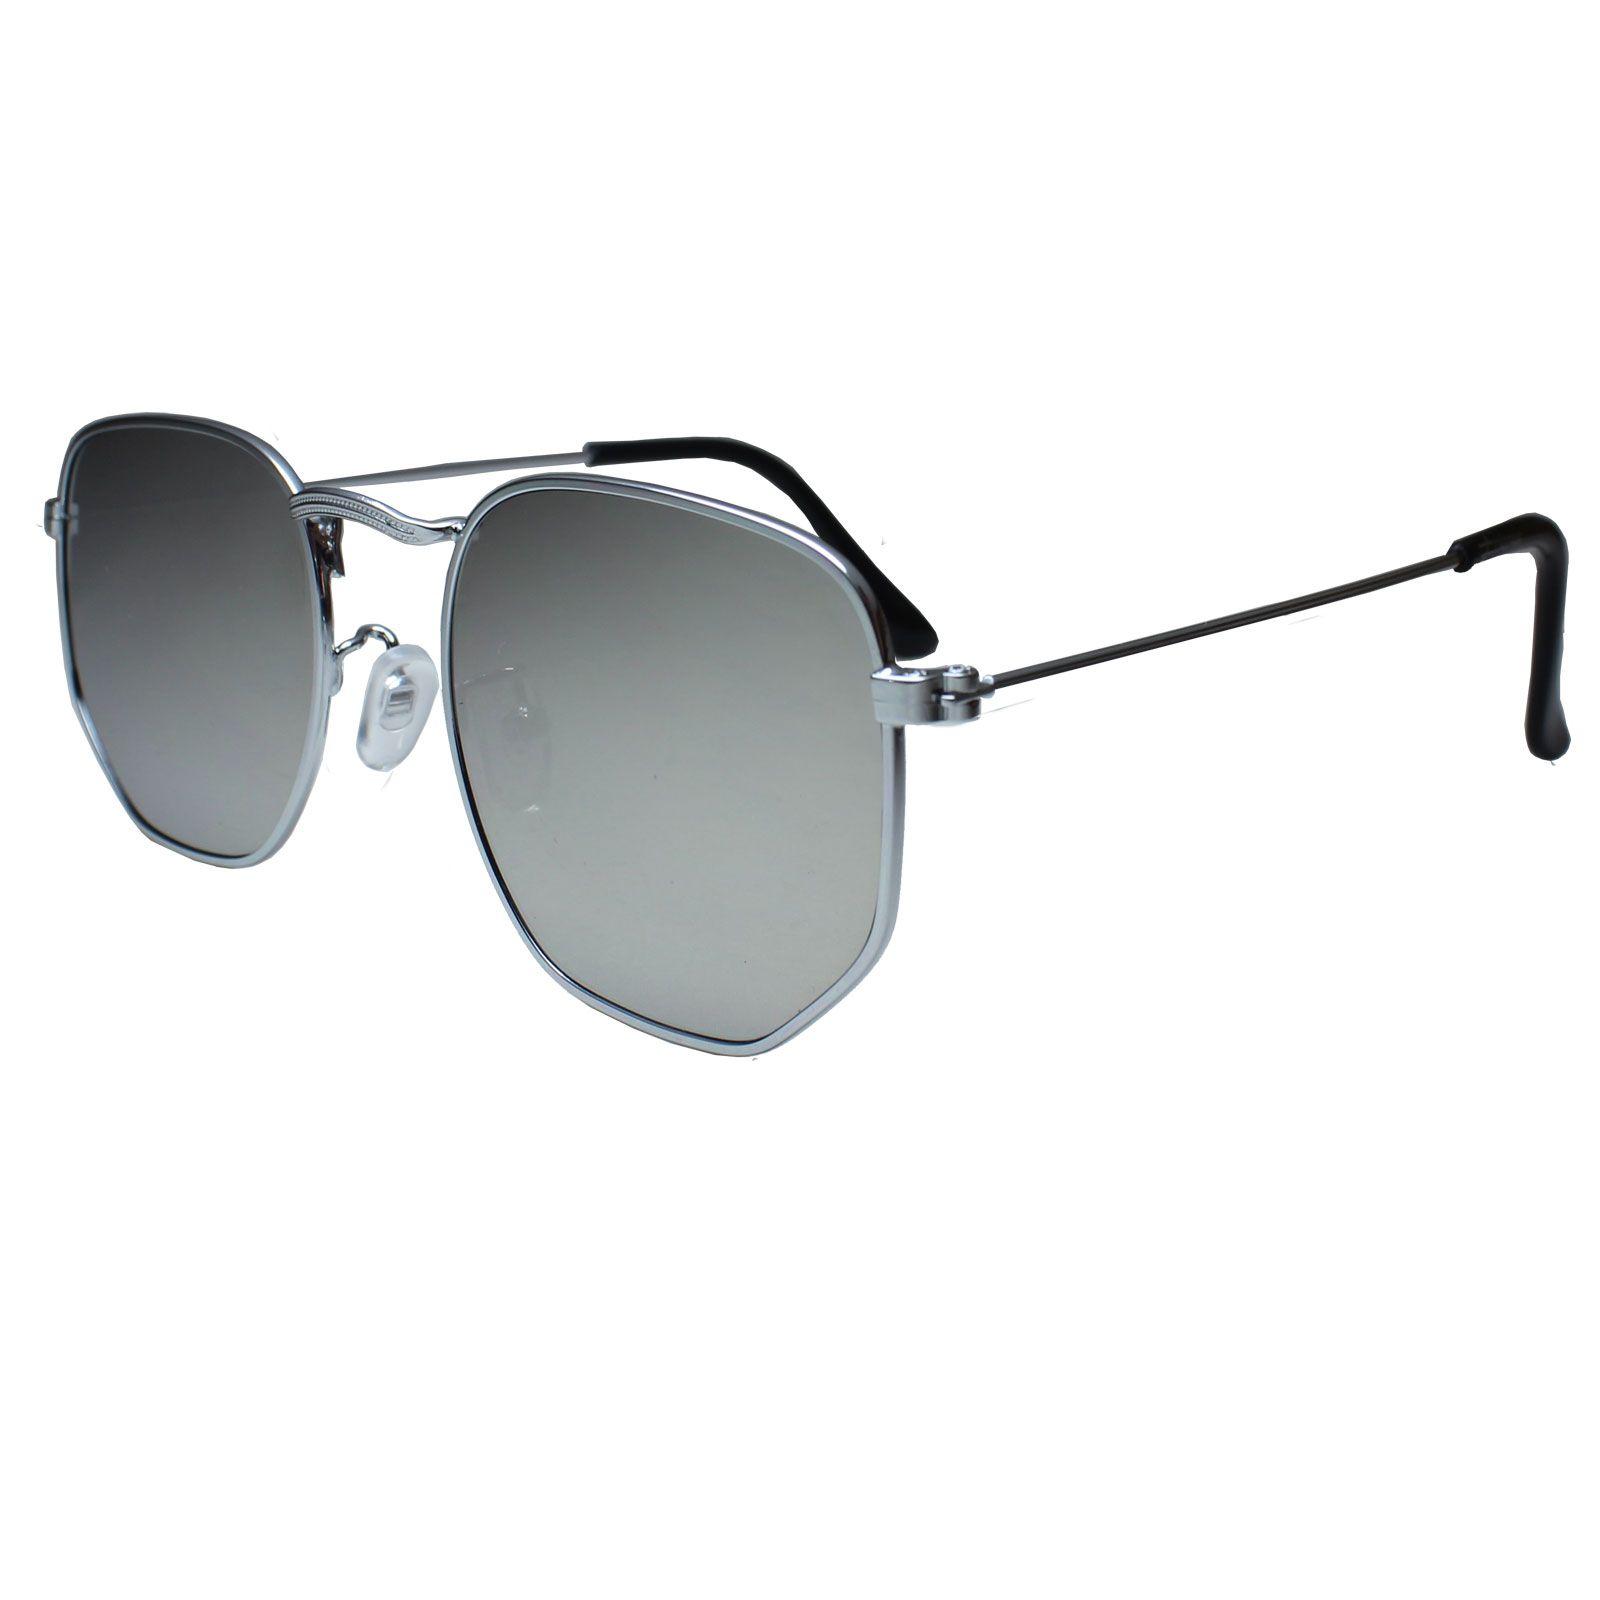 Óculos De Sol Díspar D1625 Hexagonal Lentes Retas Prata